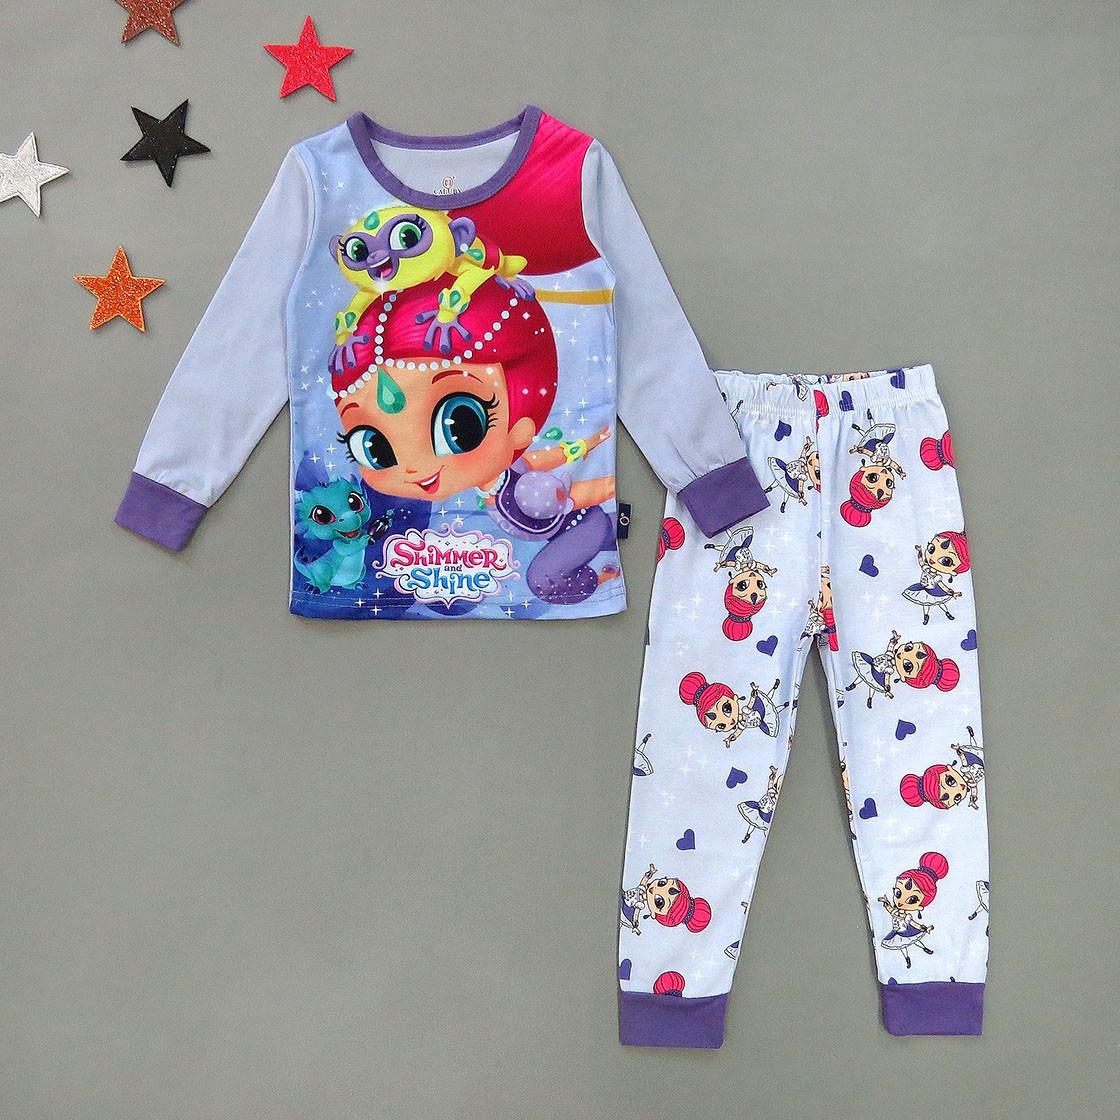 Пижама Shimmer and Shine для девочки.